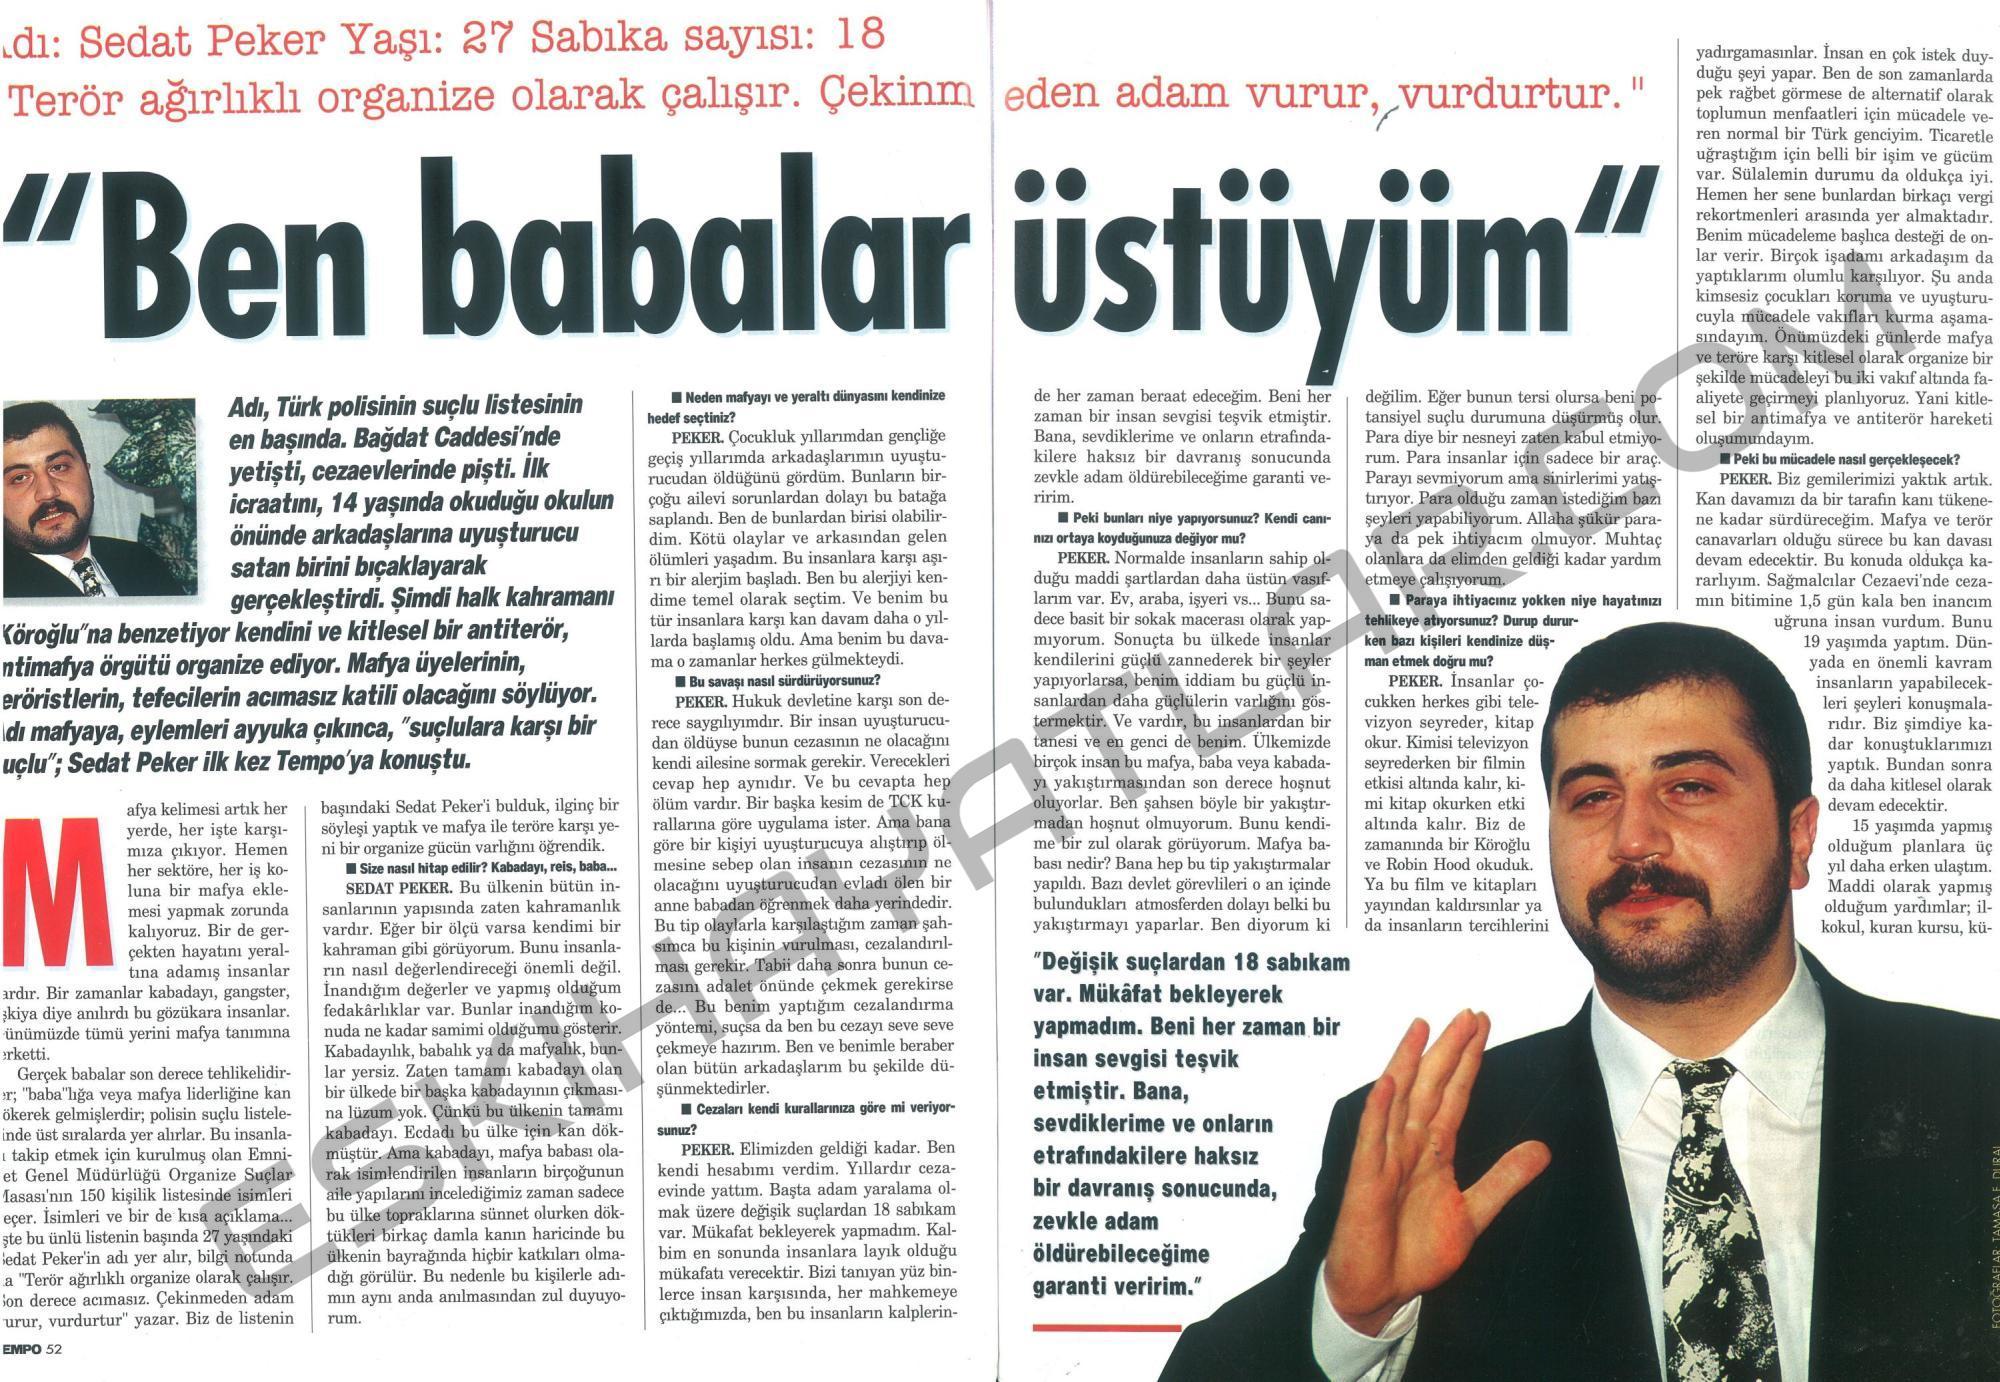 sedat-peker-ben-babalar-ustuyum-1996-tempo-dergisi-roportaji (1)